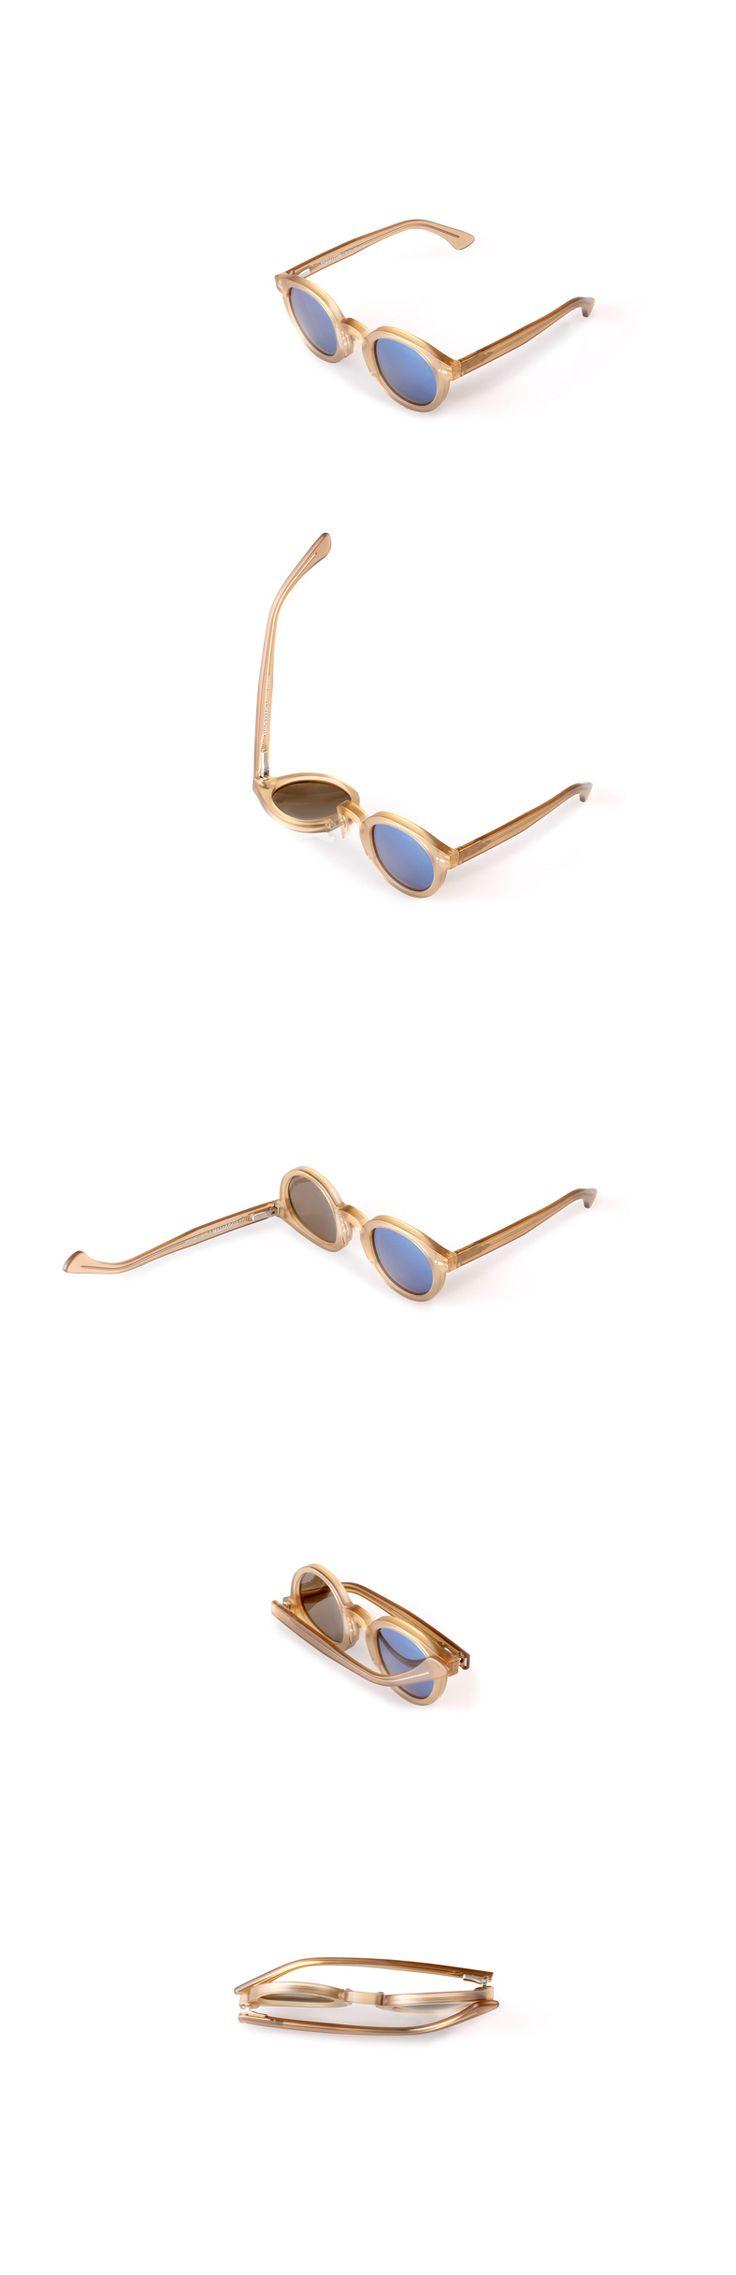 Movitra 315 - Cristallo miele con lente flash blue sky #sunglasses #movitra #movitraspectacles #spectacles #glasses #eyewear